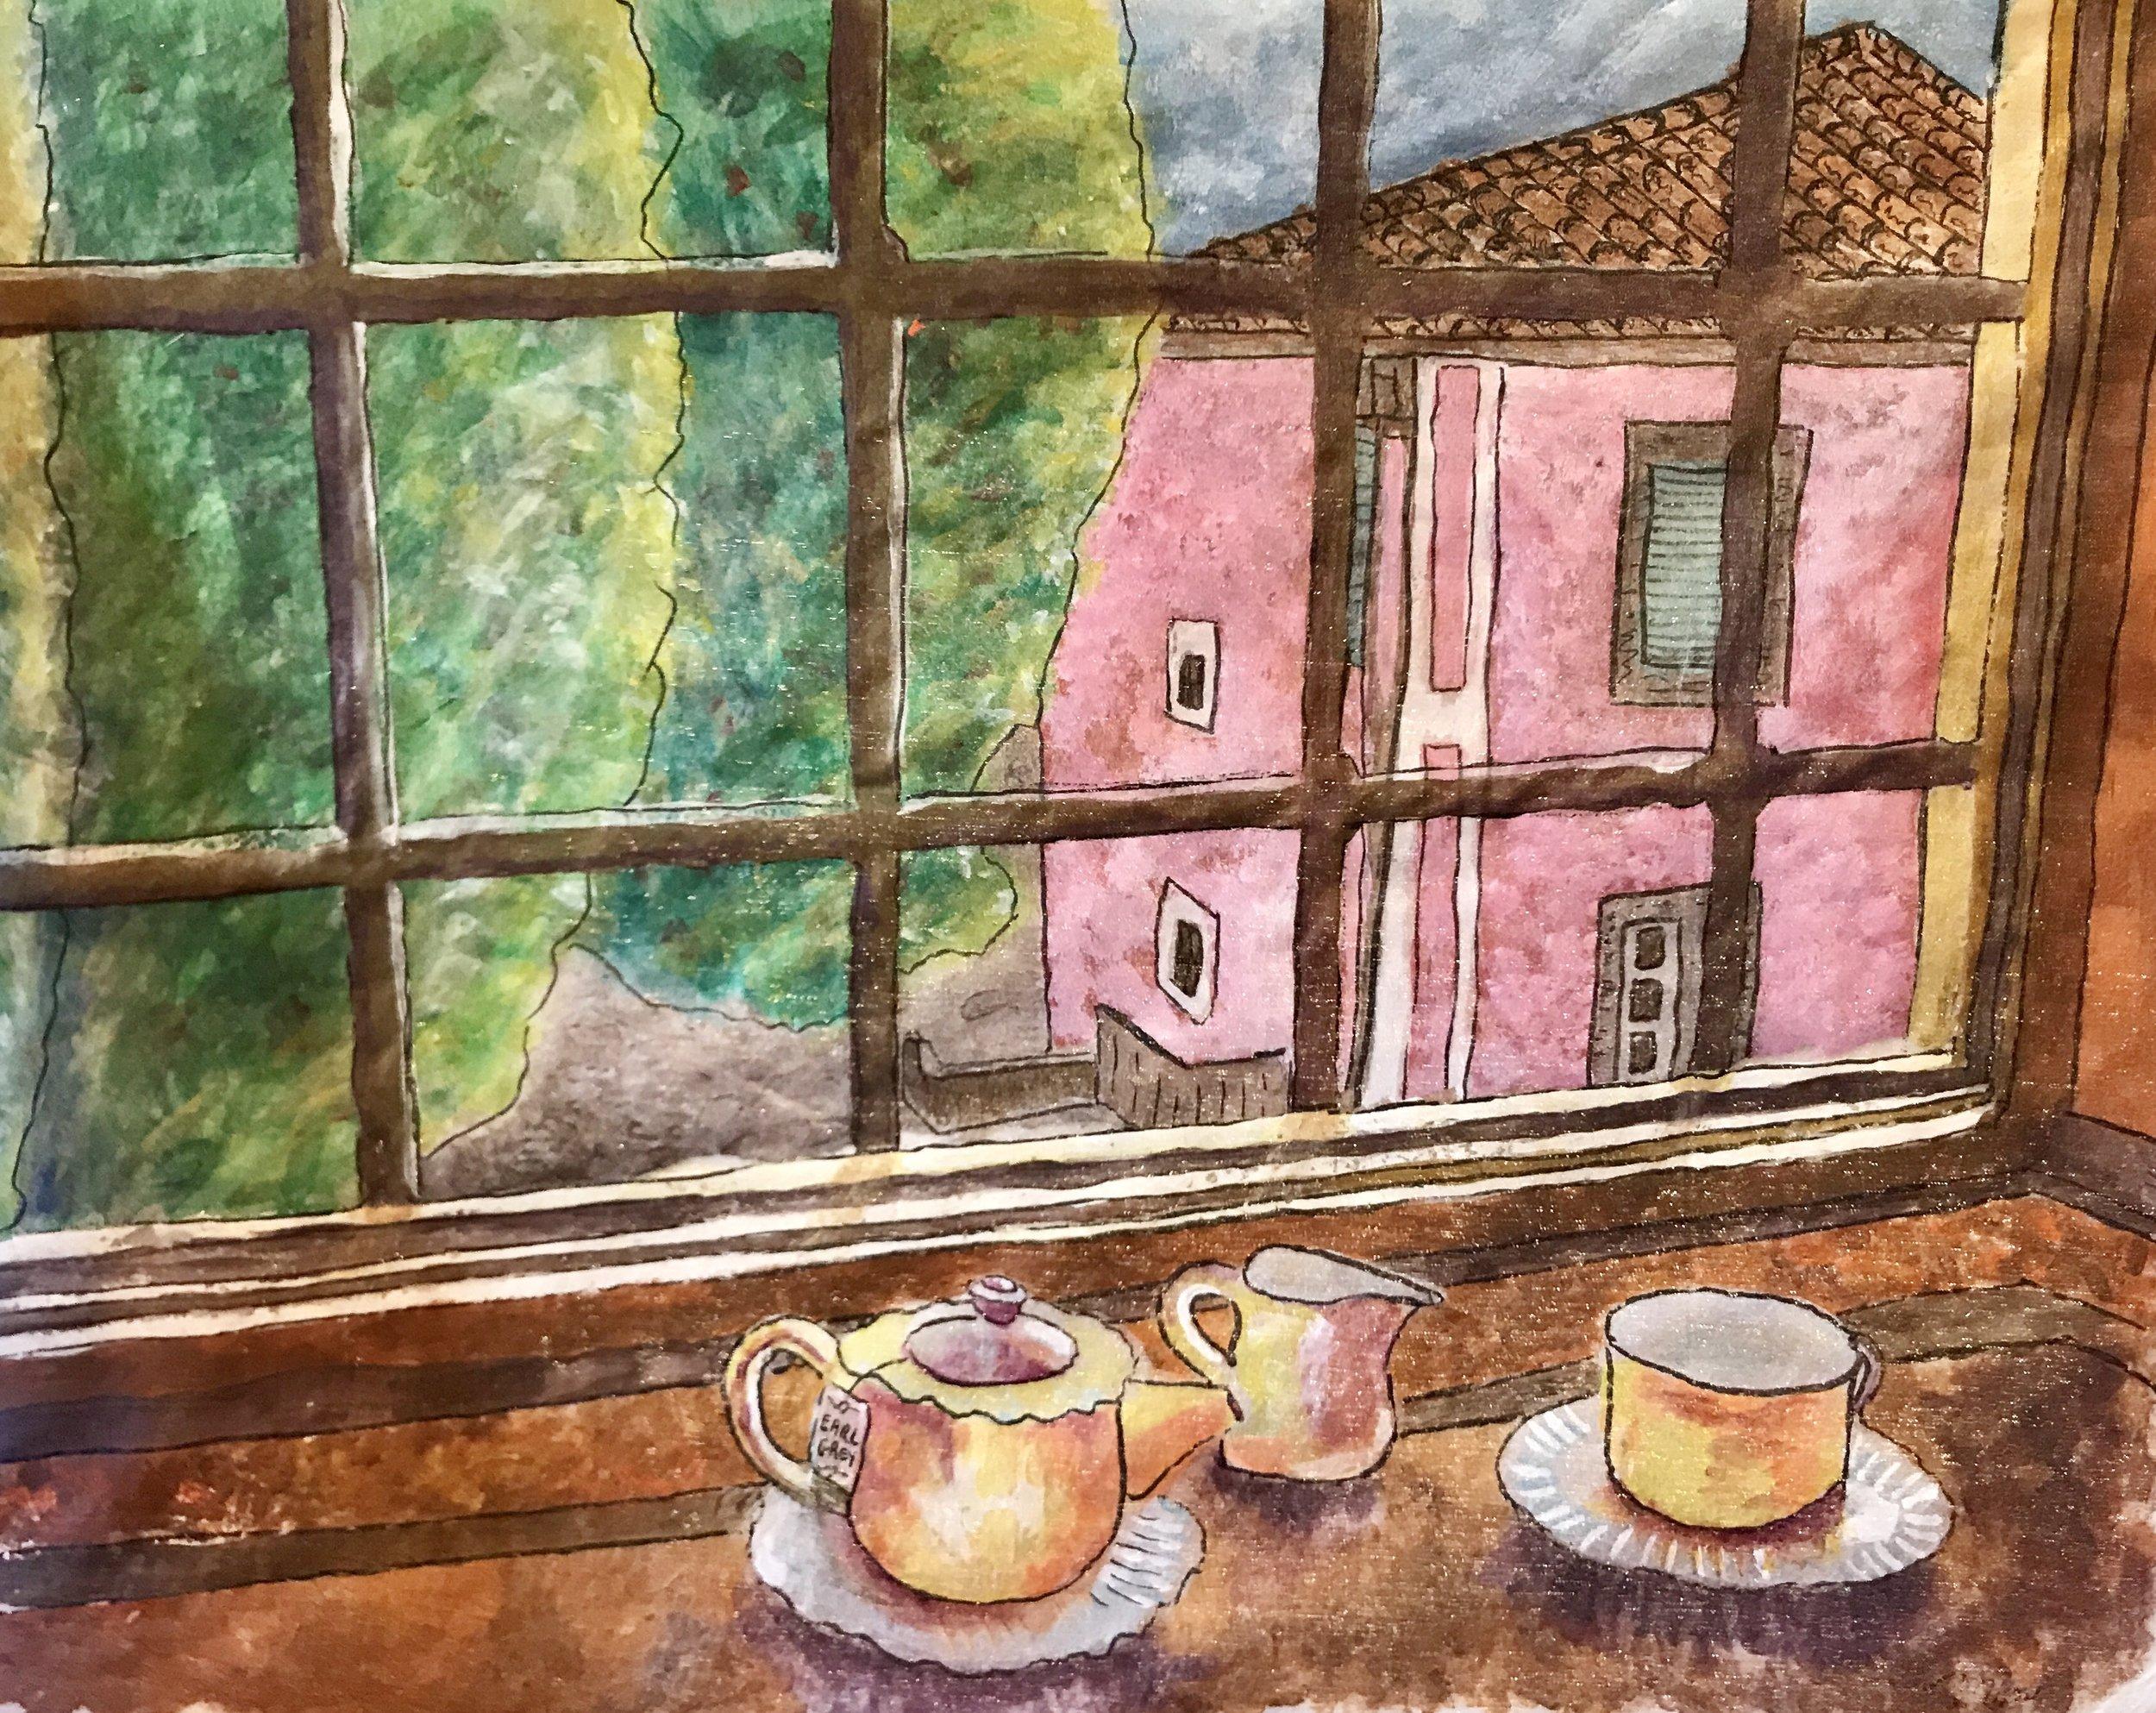 looking out the studio window:villa.jpg